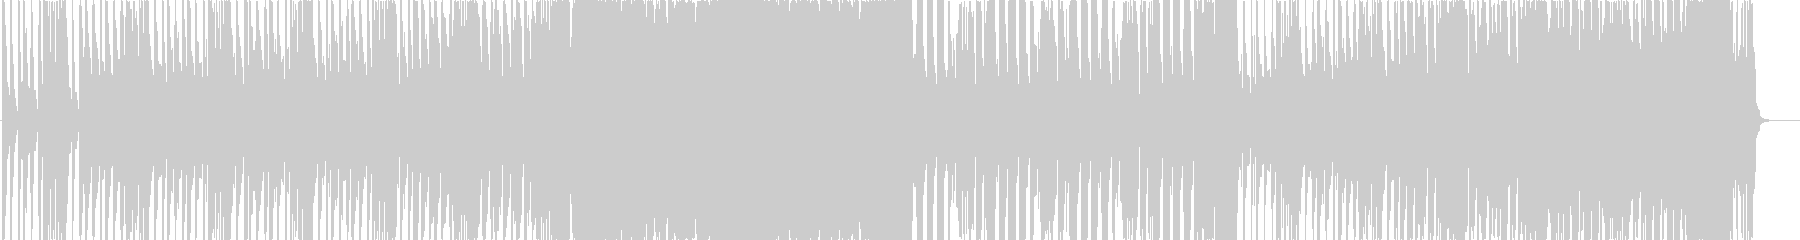 EDM+スパニッシュアンセムの未再生の波形